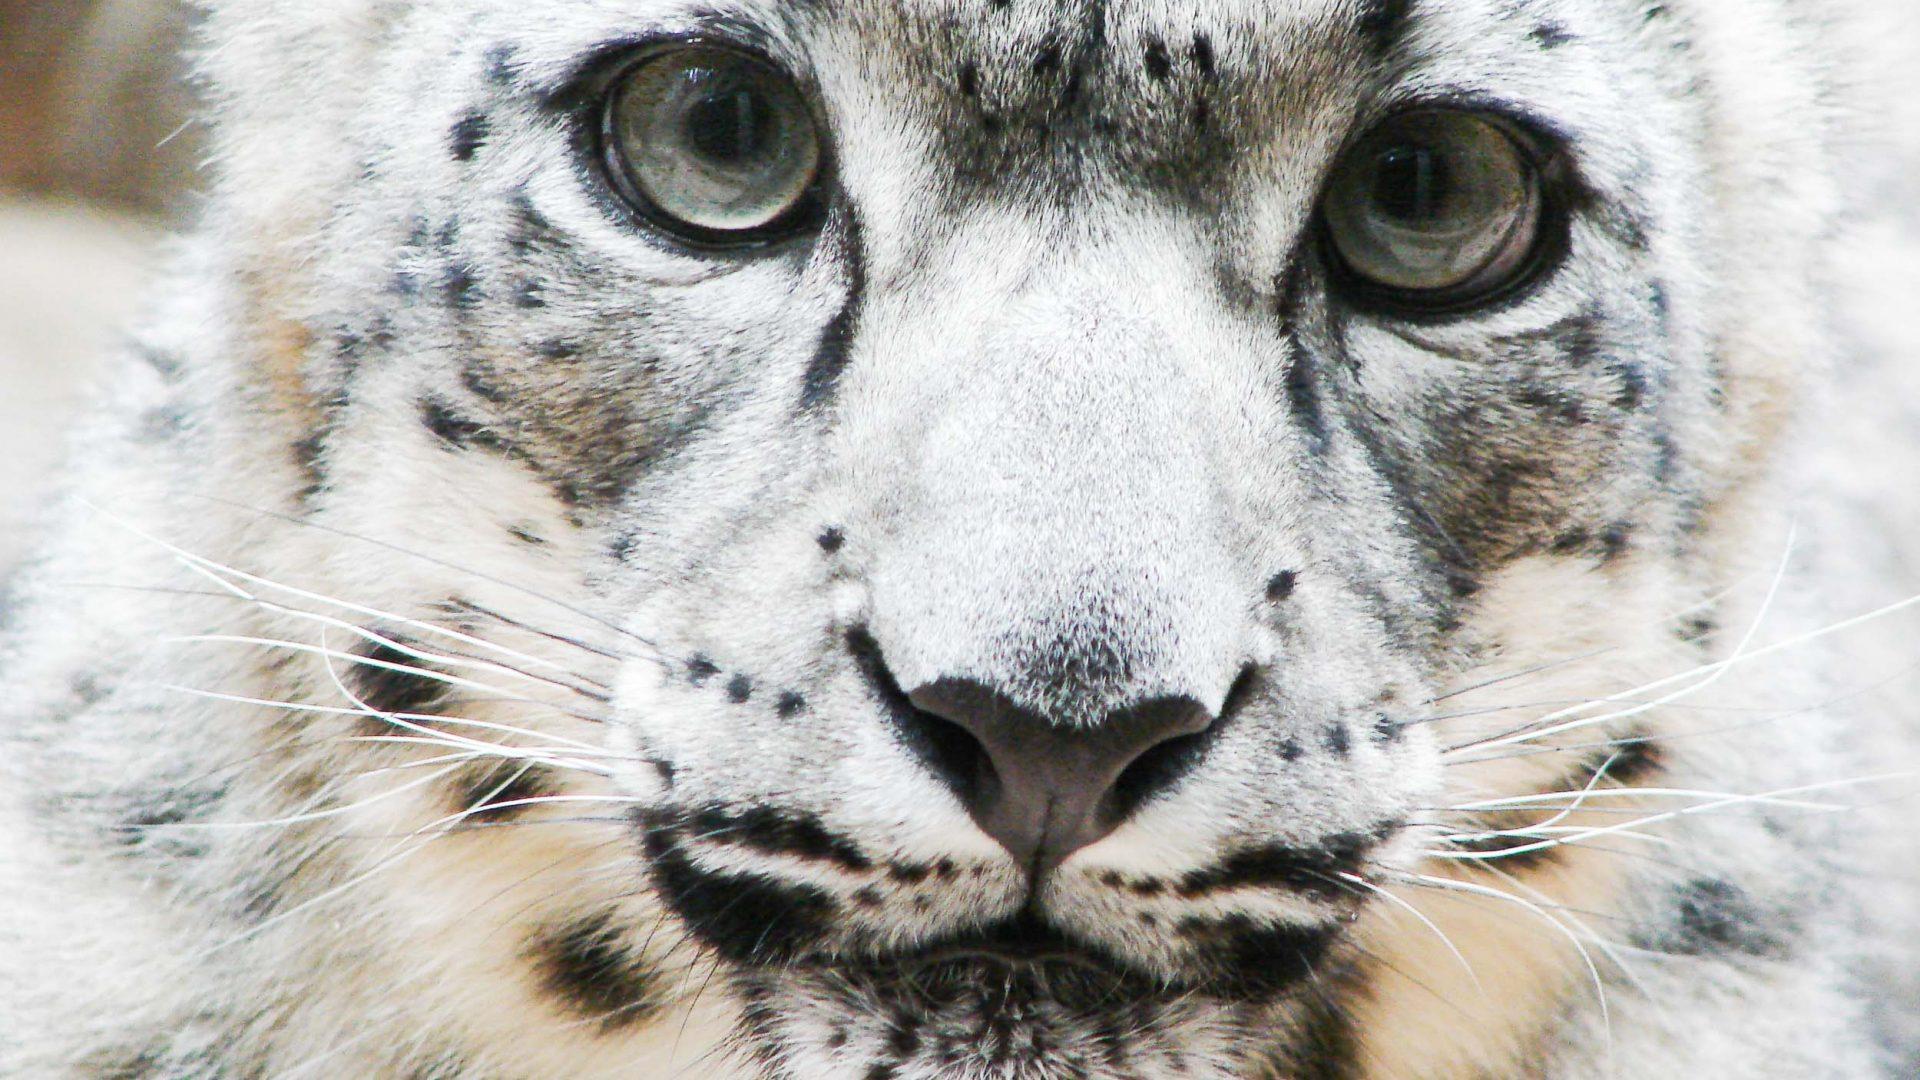 Close up of a snow leopard.